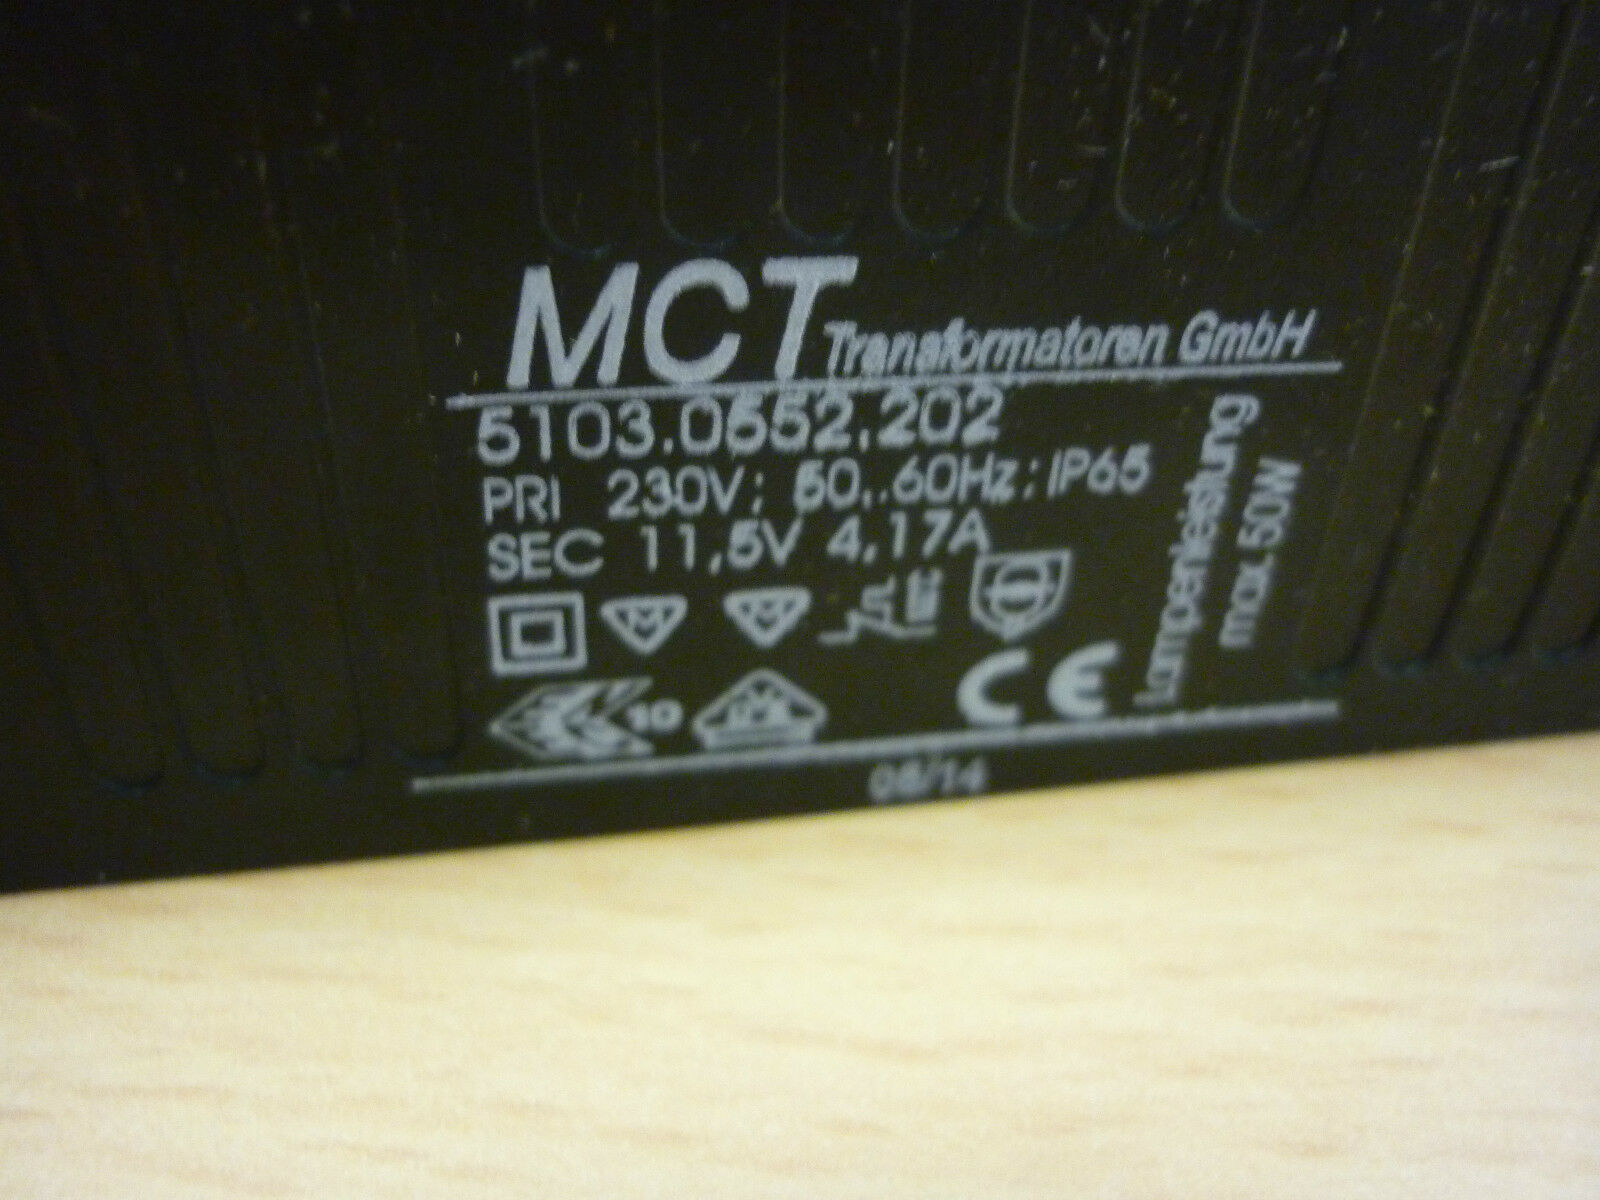 MCT vergossener Sicherheitstransformator Trafo 5103.0552.202 11,5V IP65 max 50W